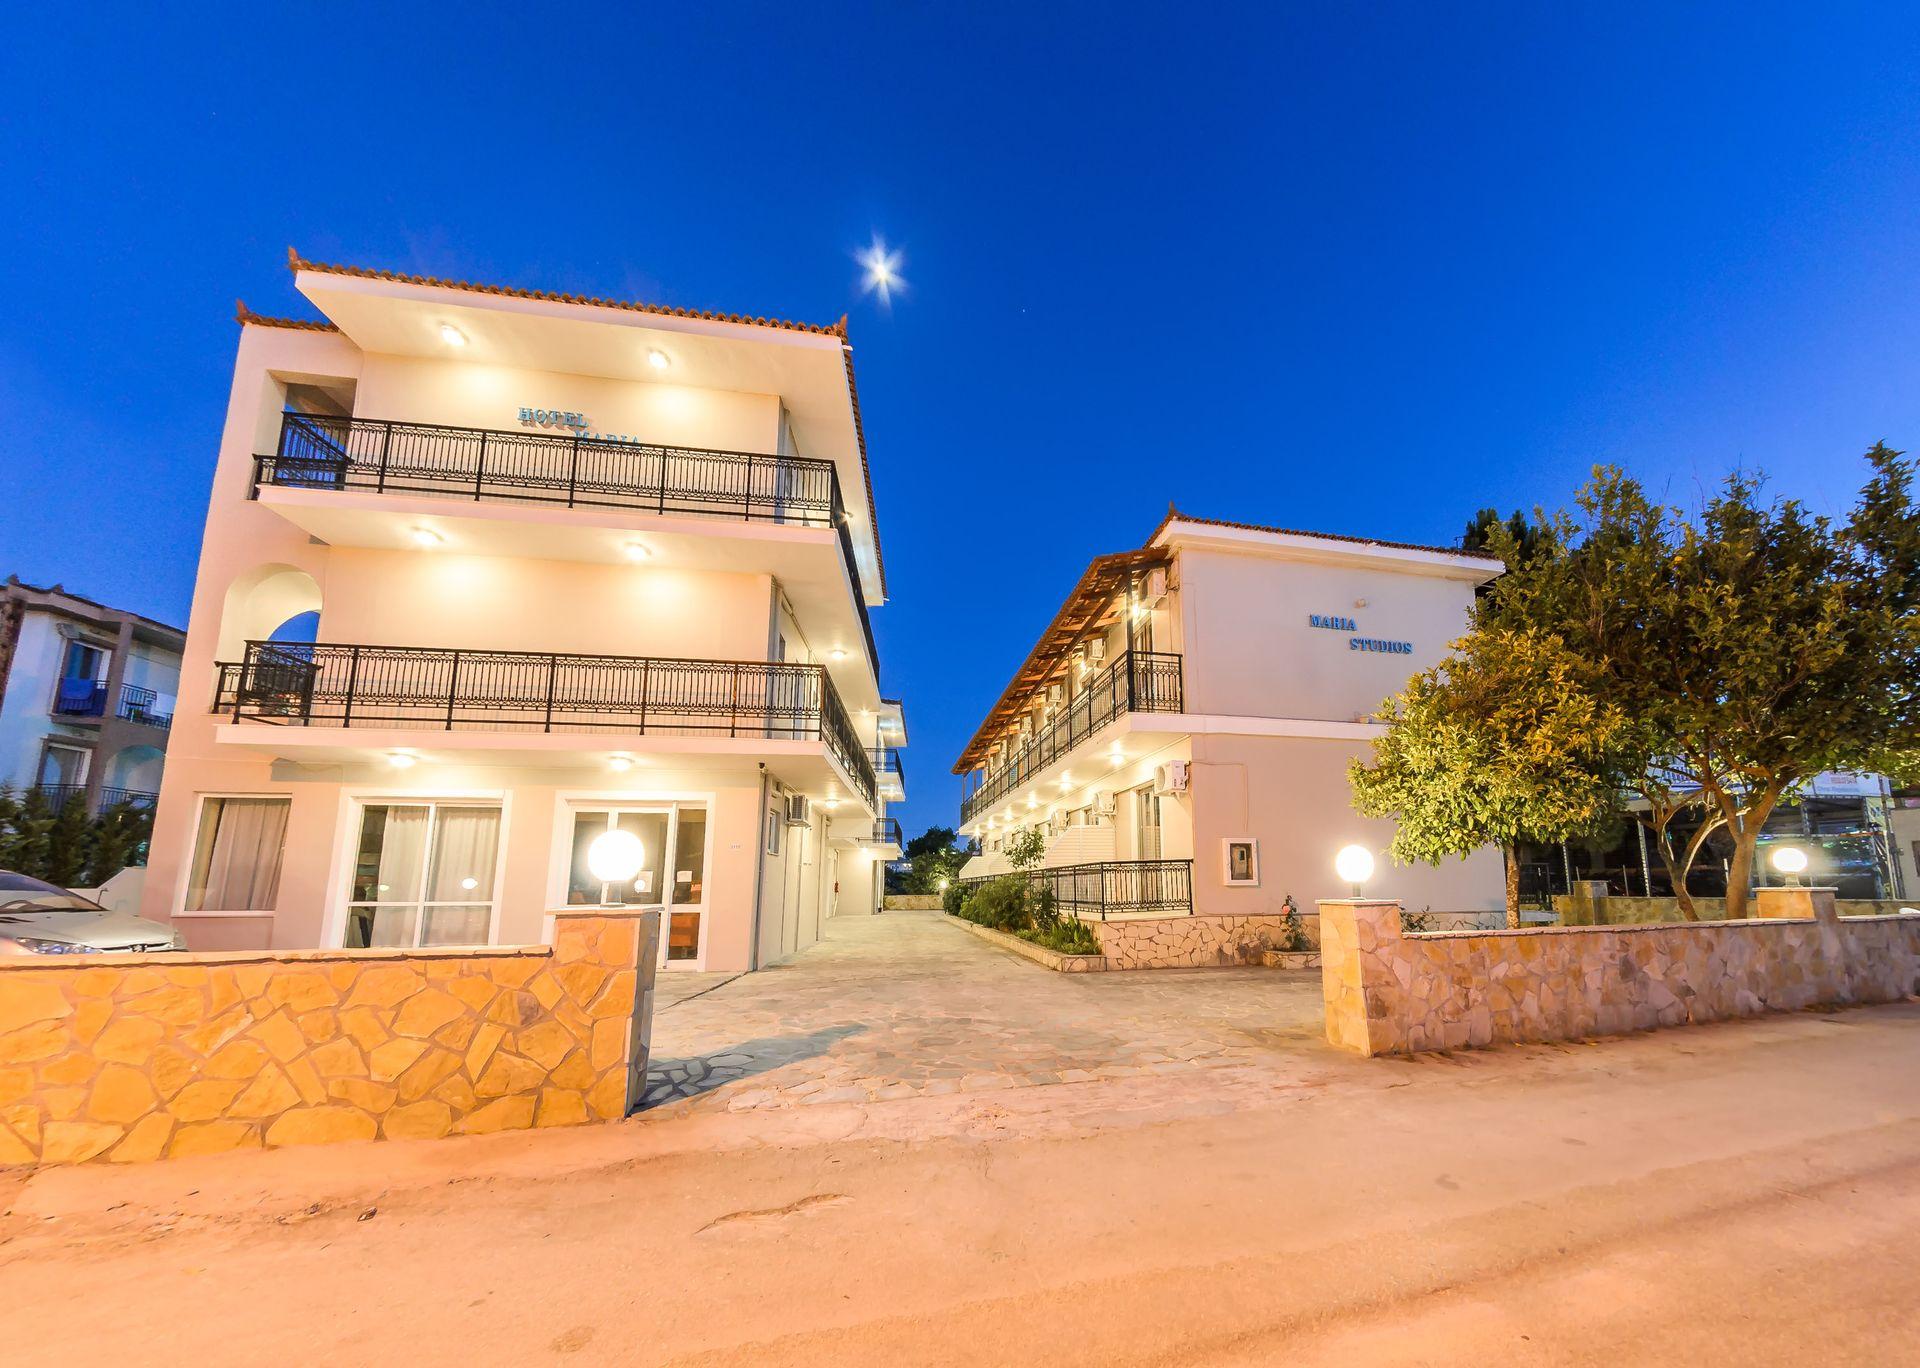 Maria Studios & Apartments Zakynthos – Ζακυνθος ✦ 3 Ημερες (2 Διανυκτερευσεις) ✦ 2 Άτομα ✦ Χωρις Πρωινο ✦ εως 31/07/2019 ✦ Ξαπλωστρες & Ομπρελες Πισινας